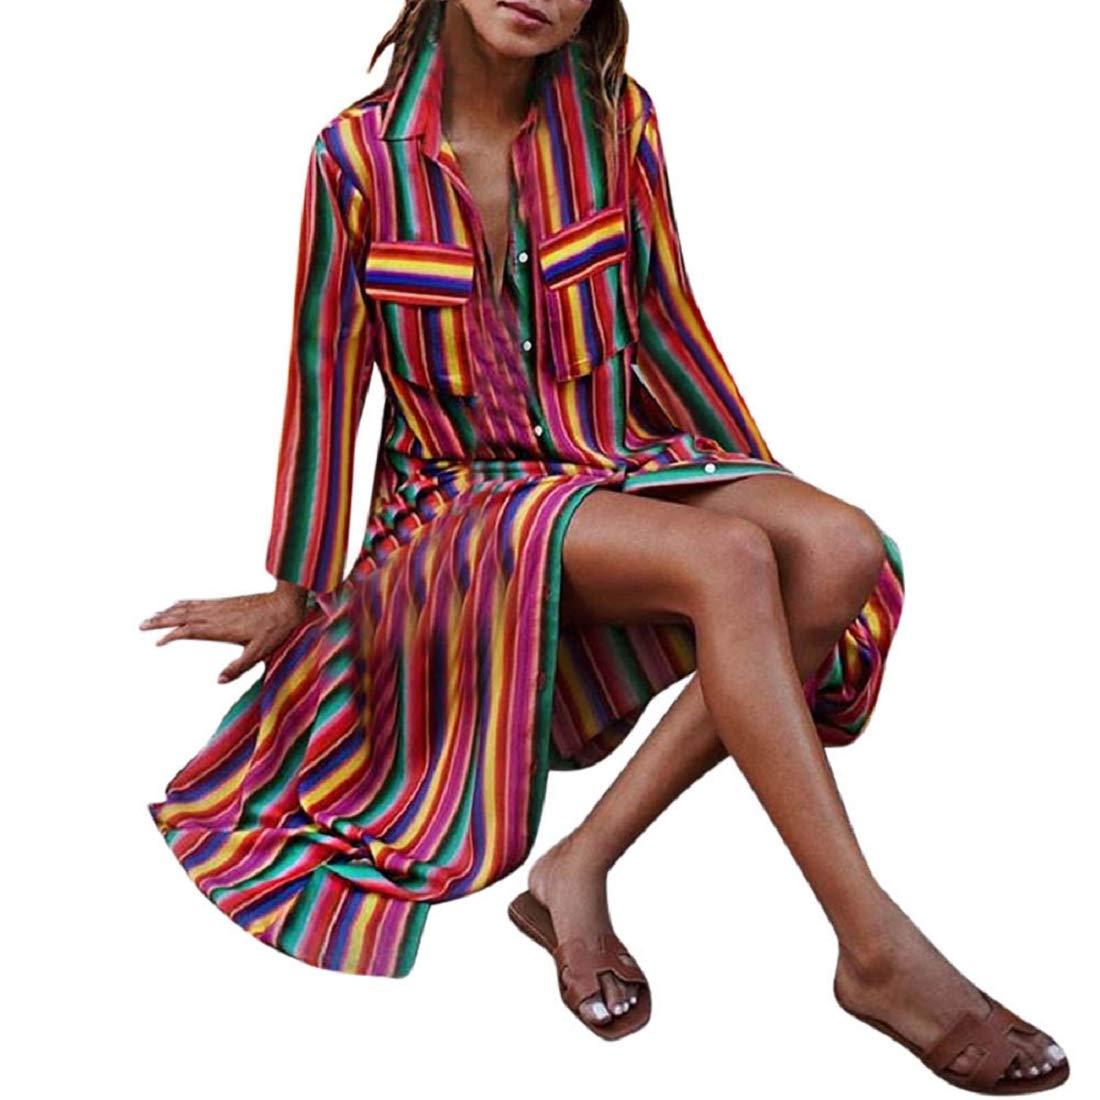 Bkolouuoe Women Multicolor Striped Buttons Lapel Long Sleeve Long Dress Casual Robe Dresses Beach Sundress